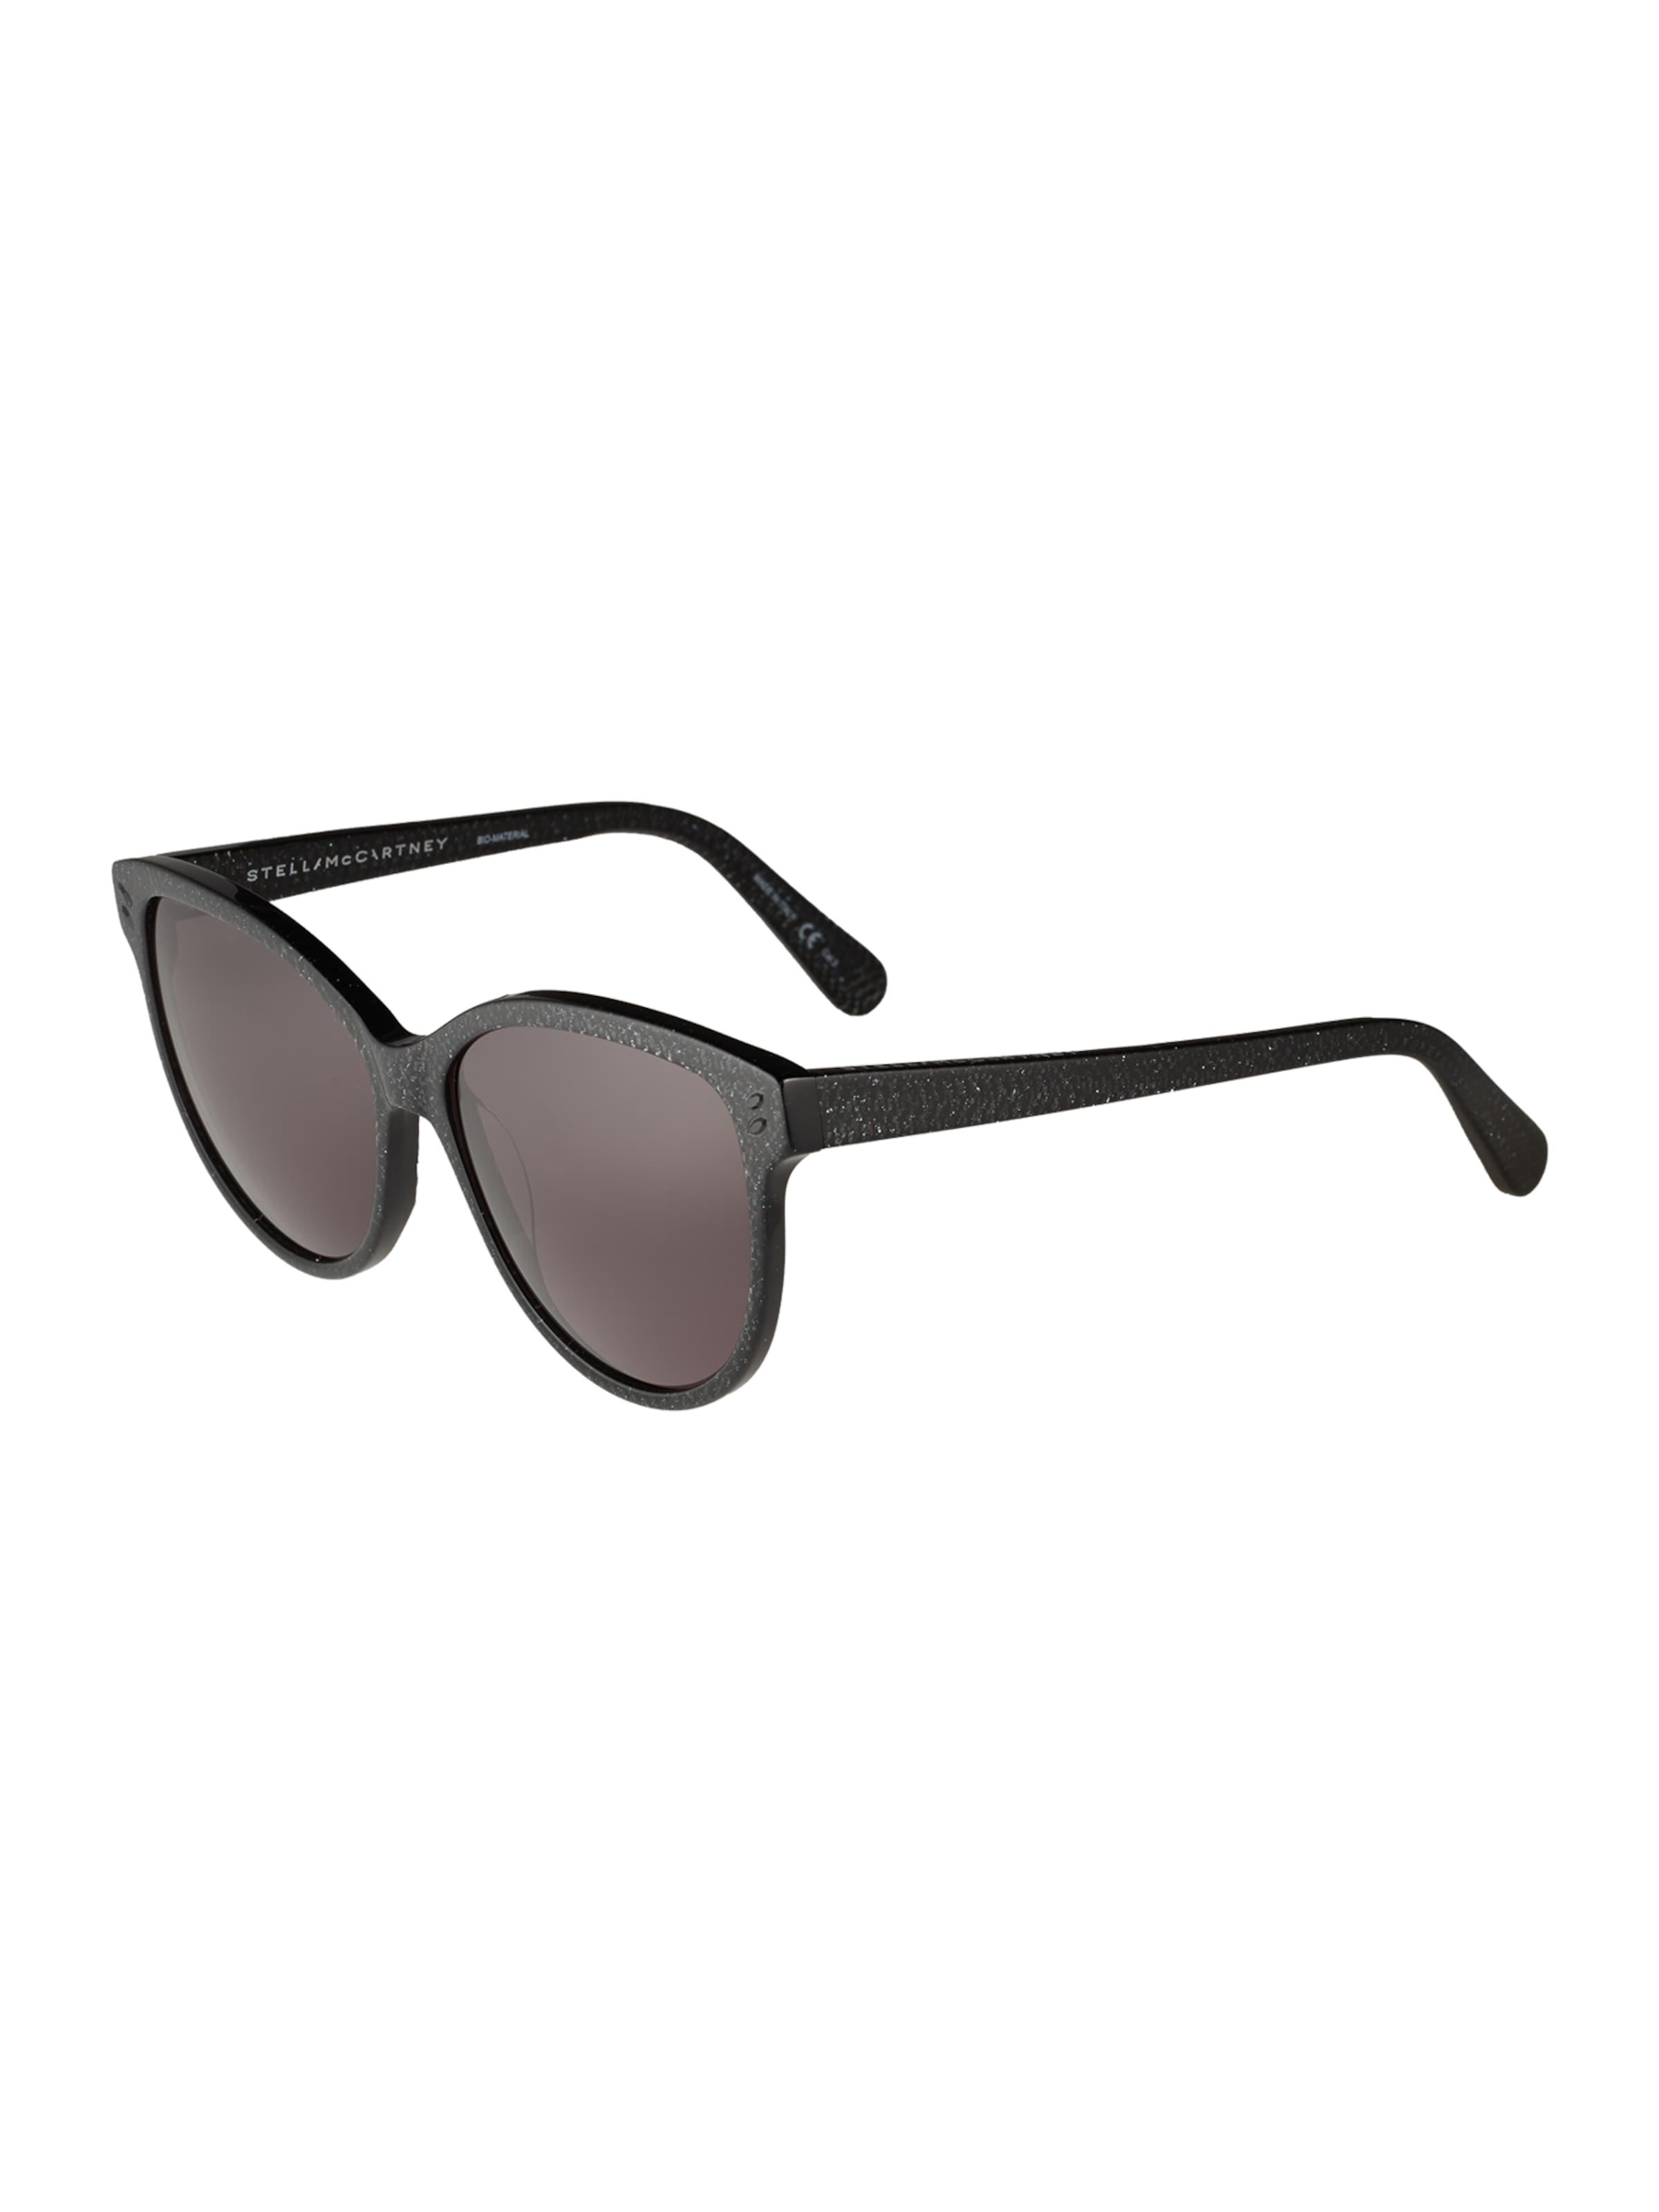 Stella McCartney Solglasögon 'SC0002S 57 Sunglass WOMAN BIO ACETAT' i grå / svart